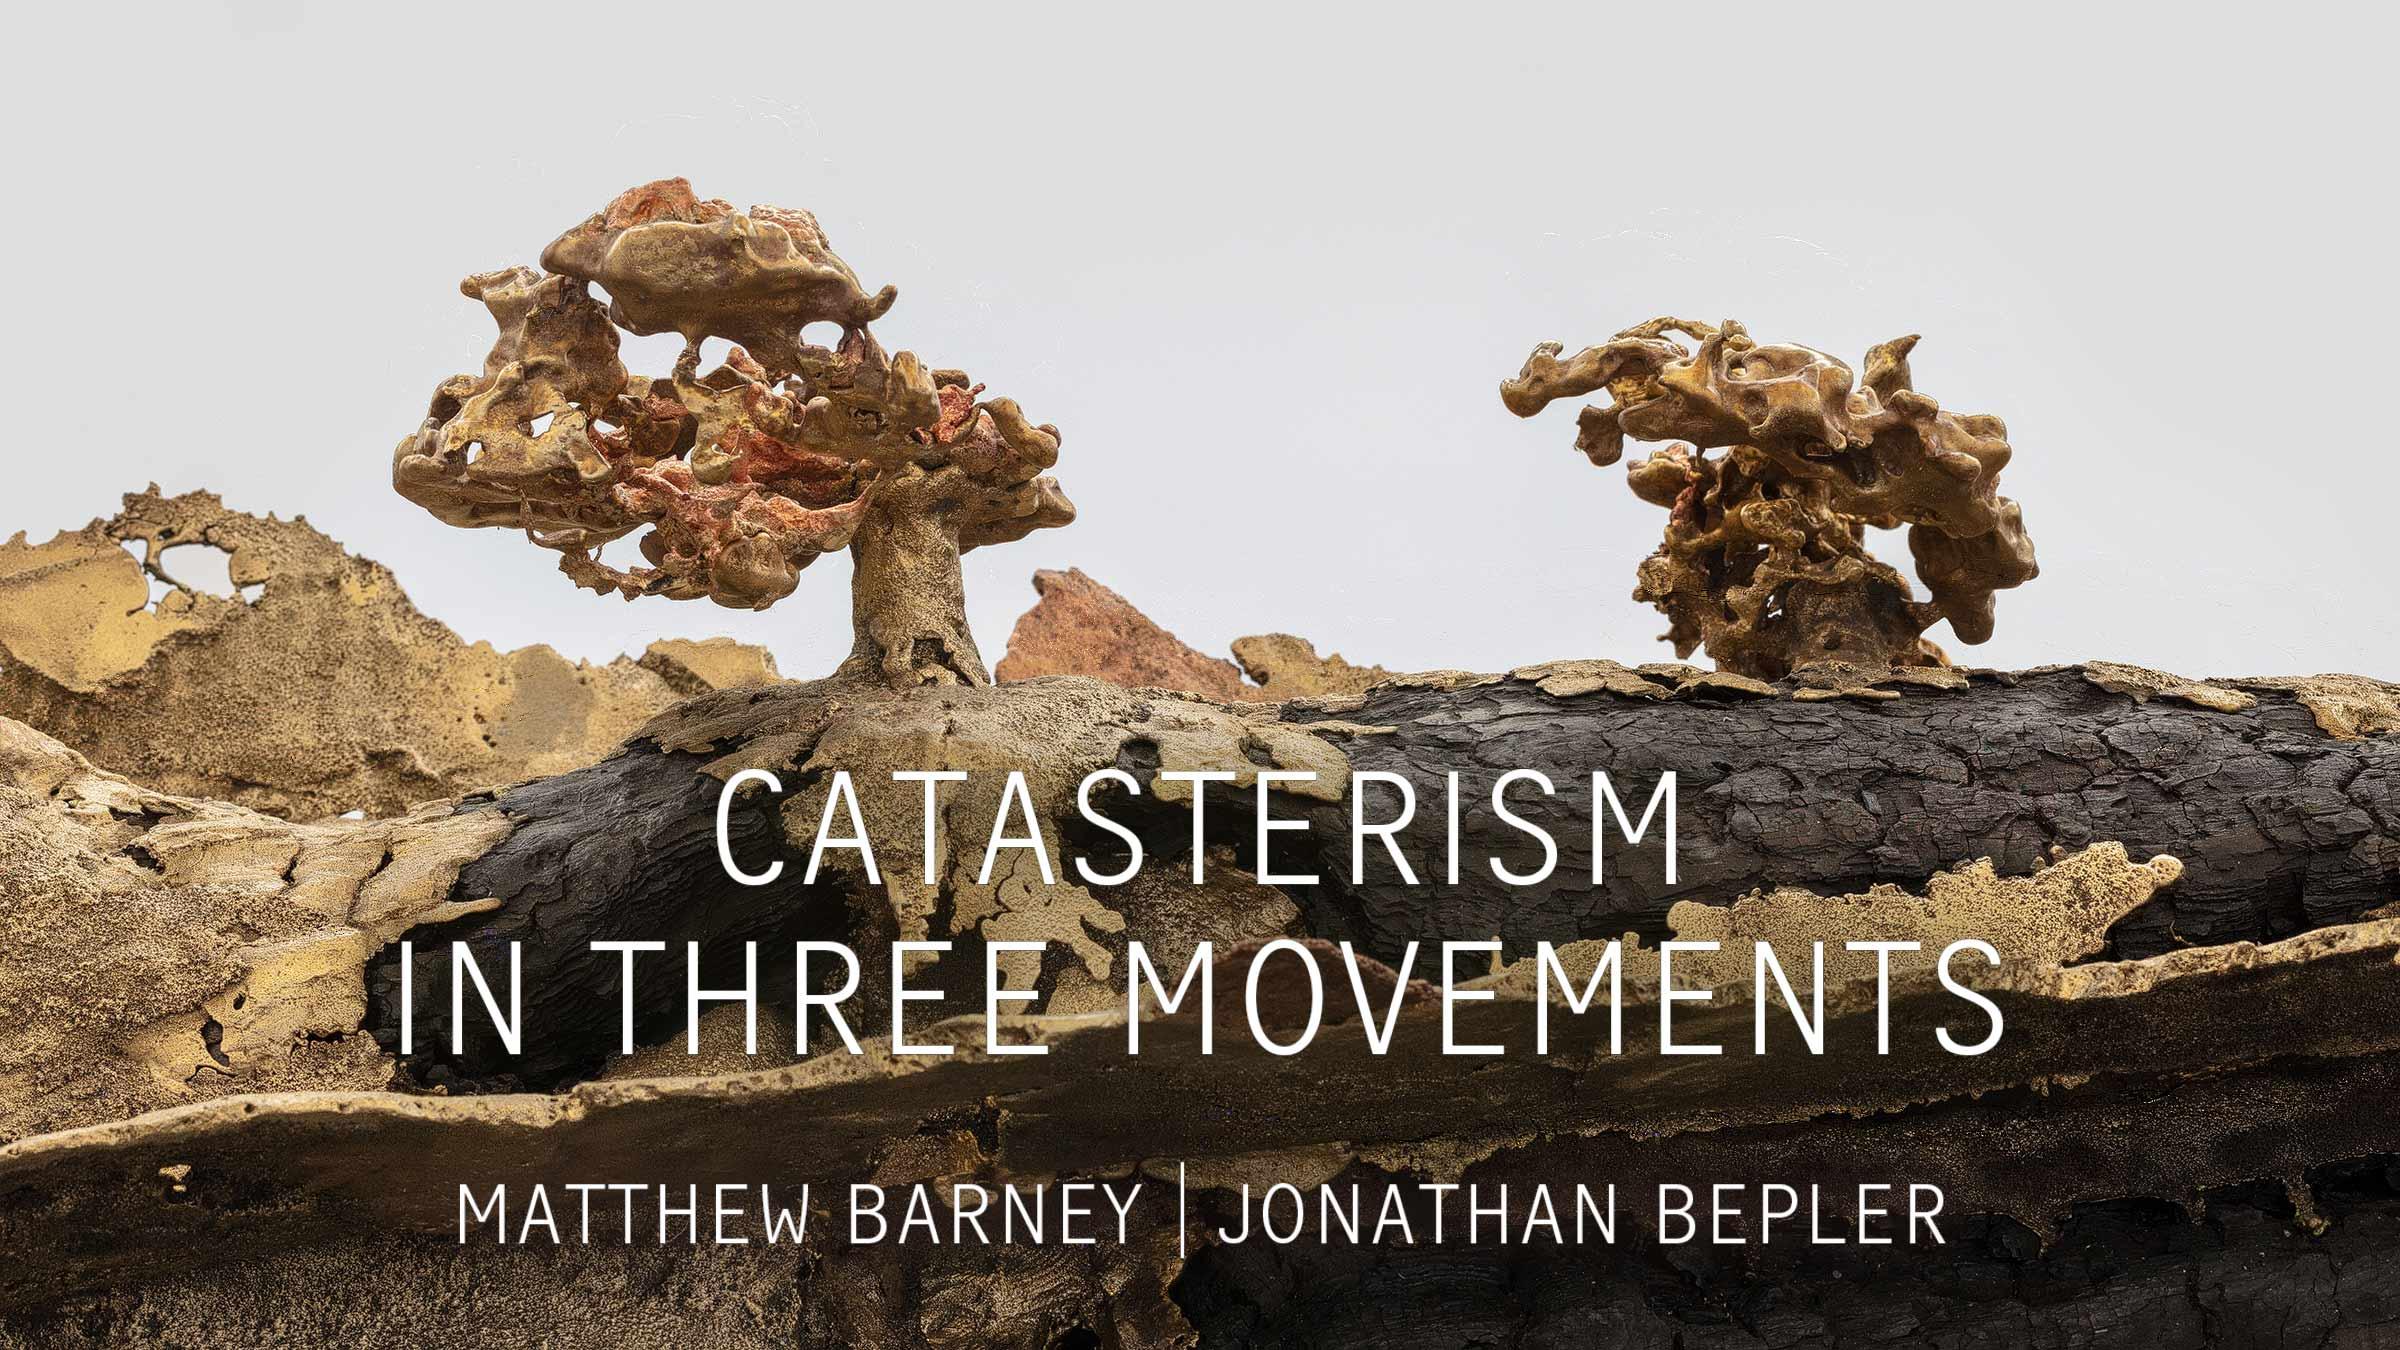 Catasterism in three movements, Matthew Barney | Jonathan Bepler, 22.–25. September 2021, 20 Uhr